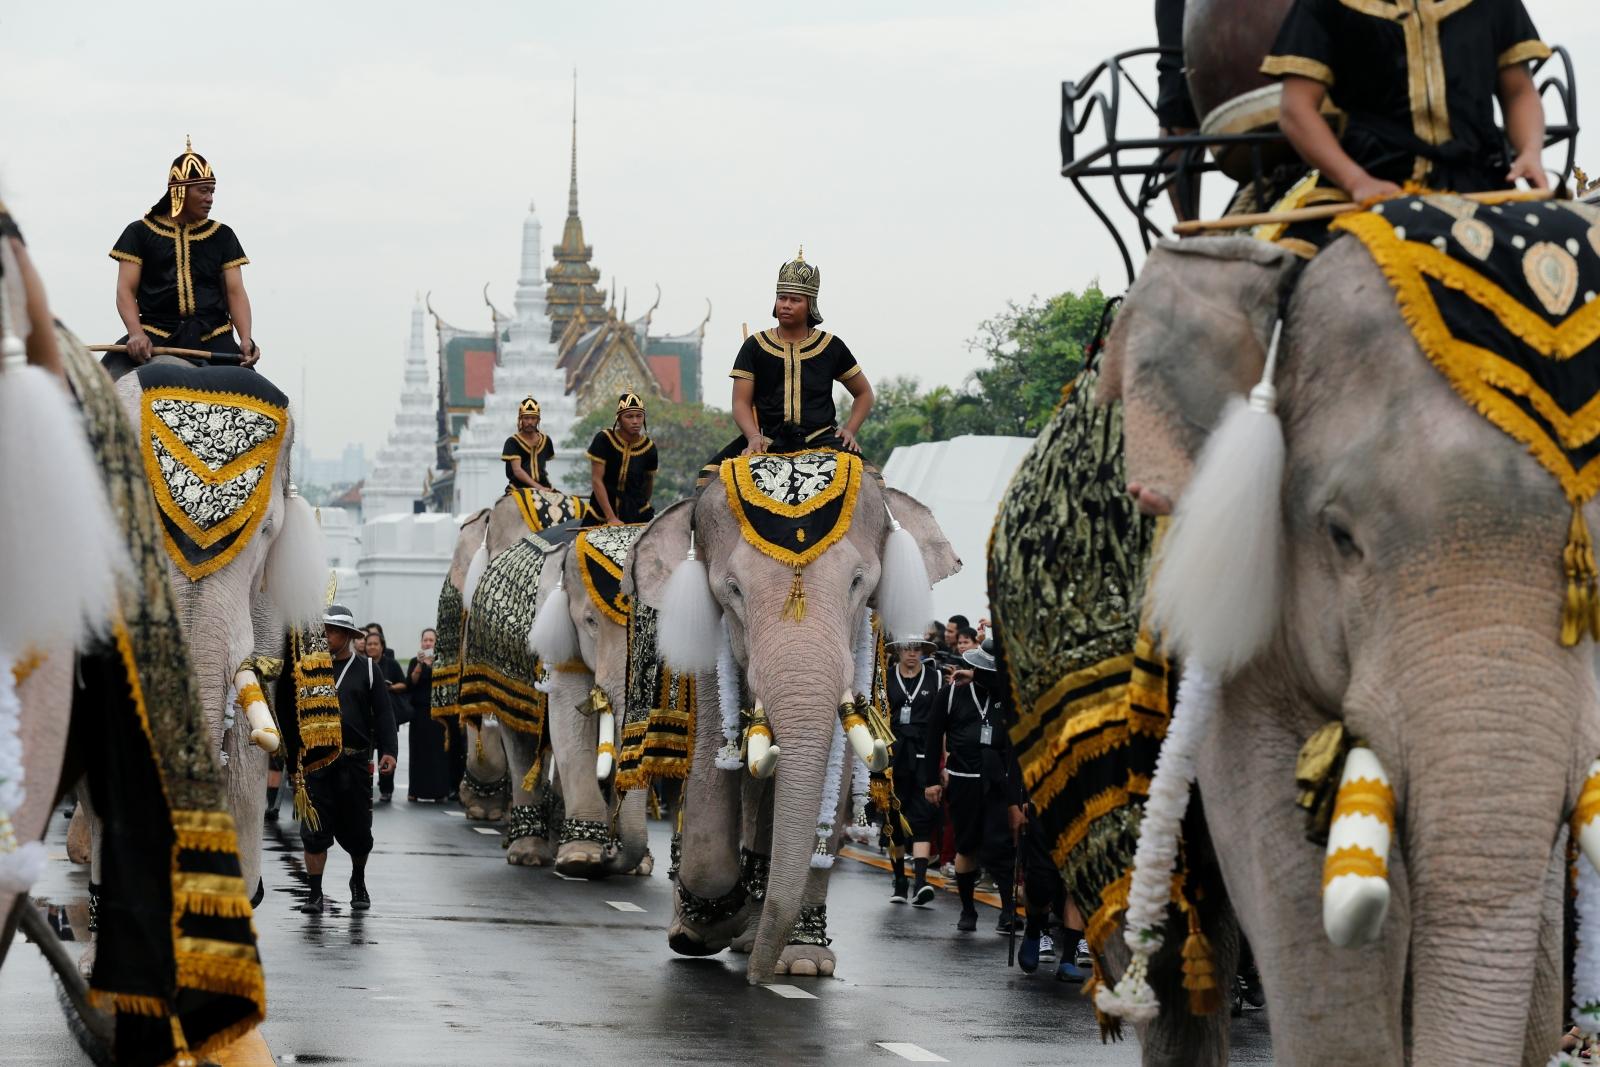 Elephant procession in Thailand honouring Bhumibol Adulyadej